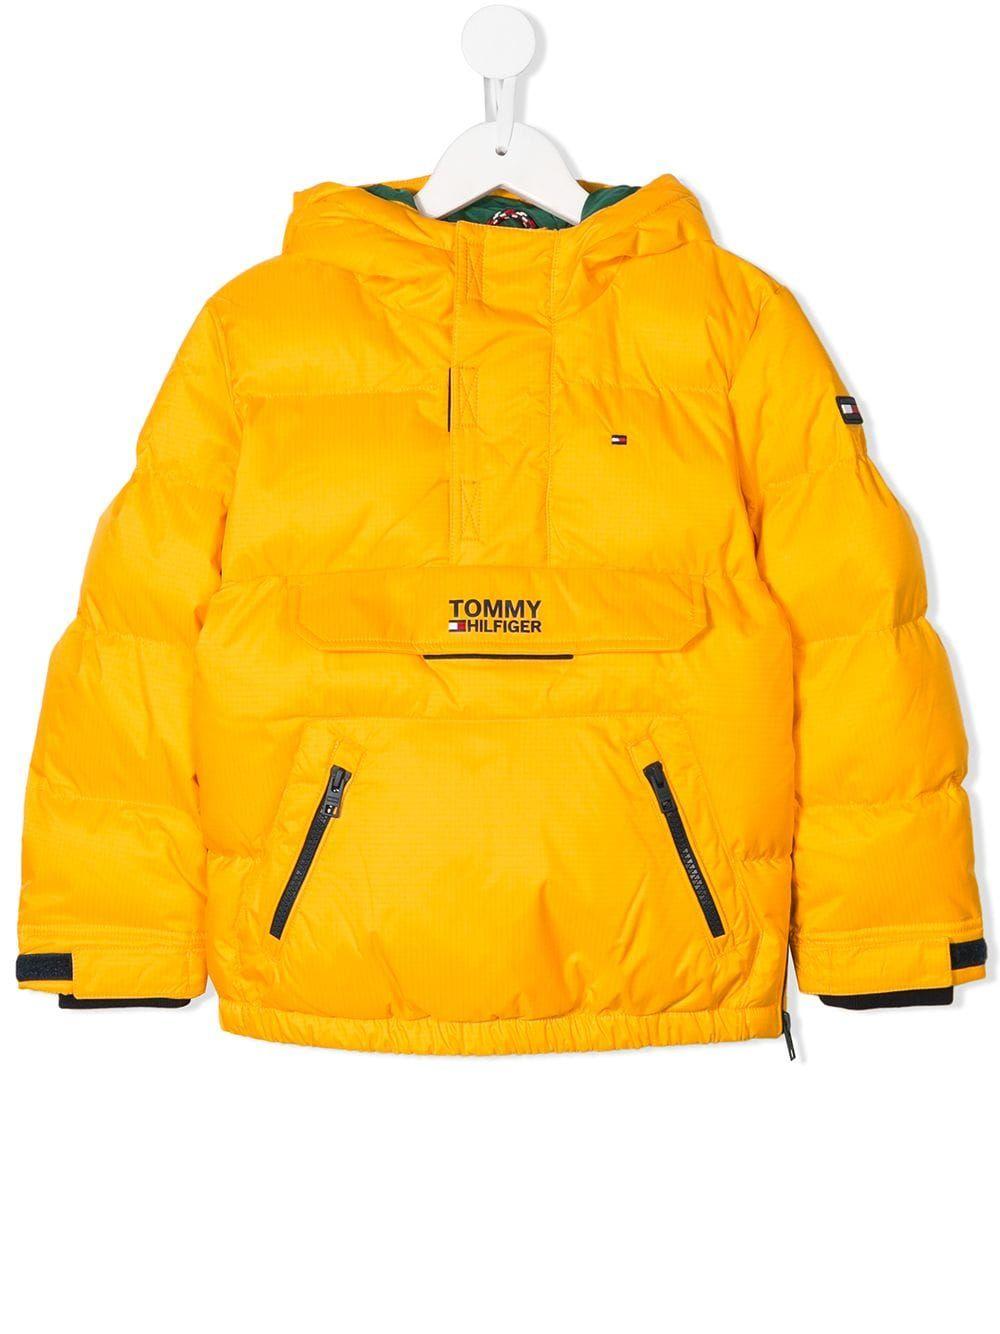 3b21fb5a3 Tommy Hilfiger Junior hooded padded jacket | KIDS NEW SEASON ...